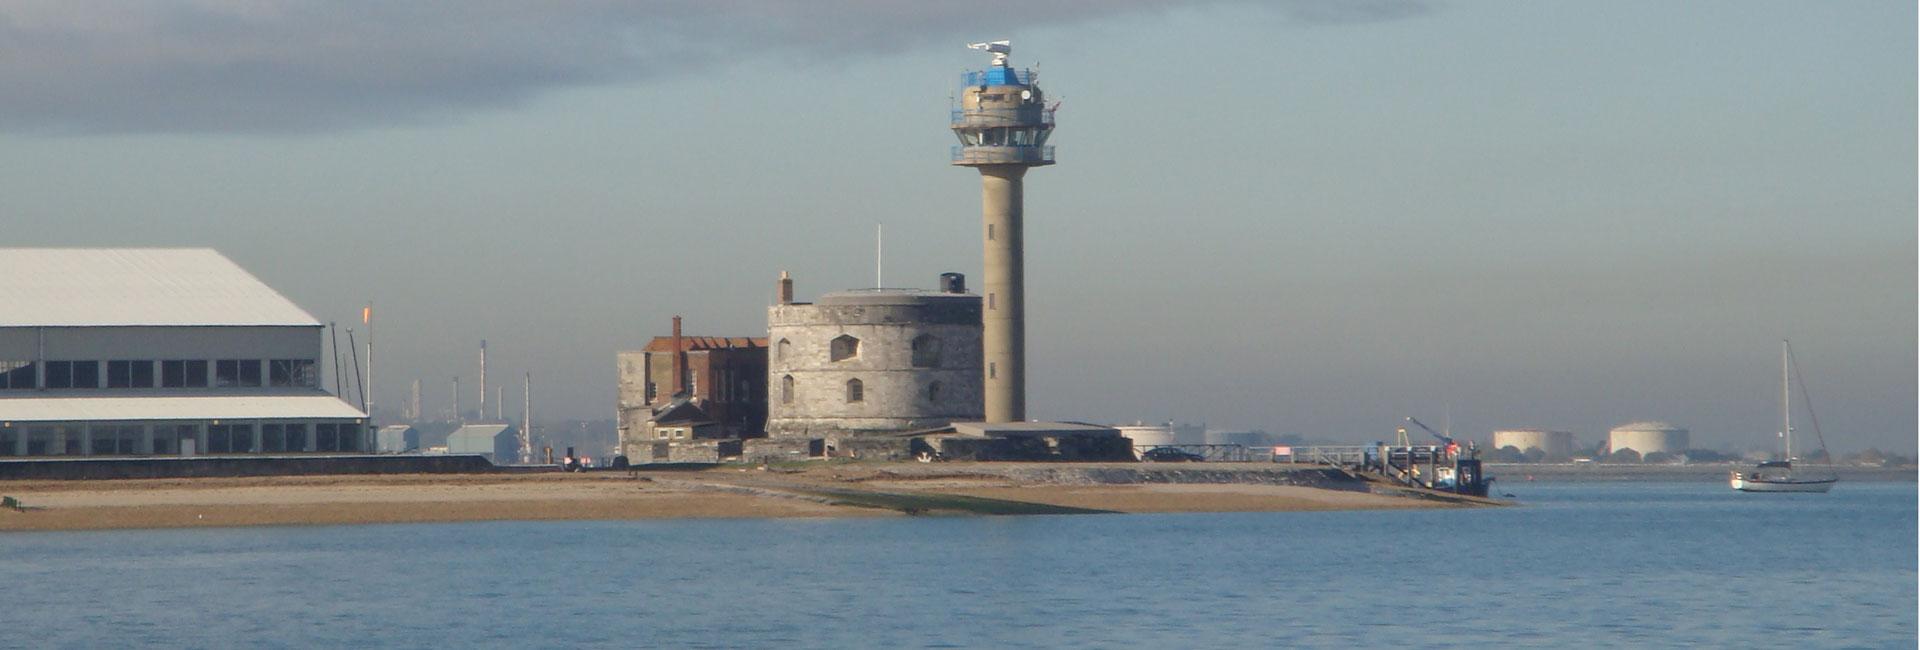 Southampton Water Guided Trip Boat Club Trafalgar